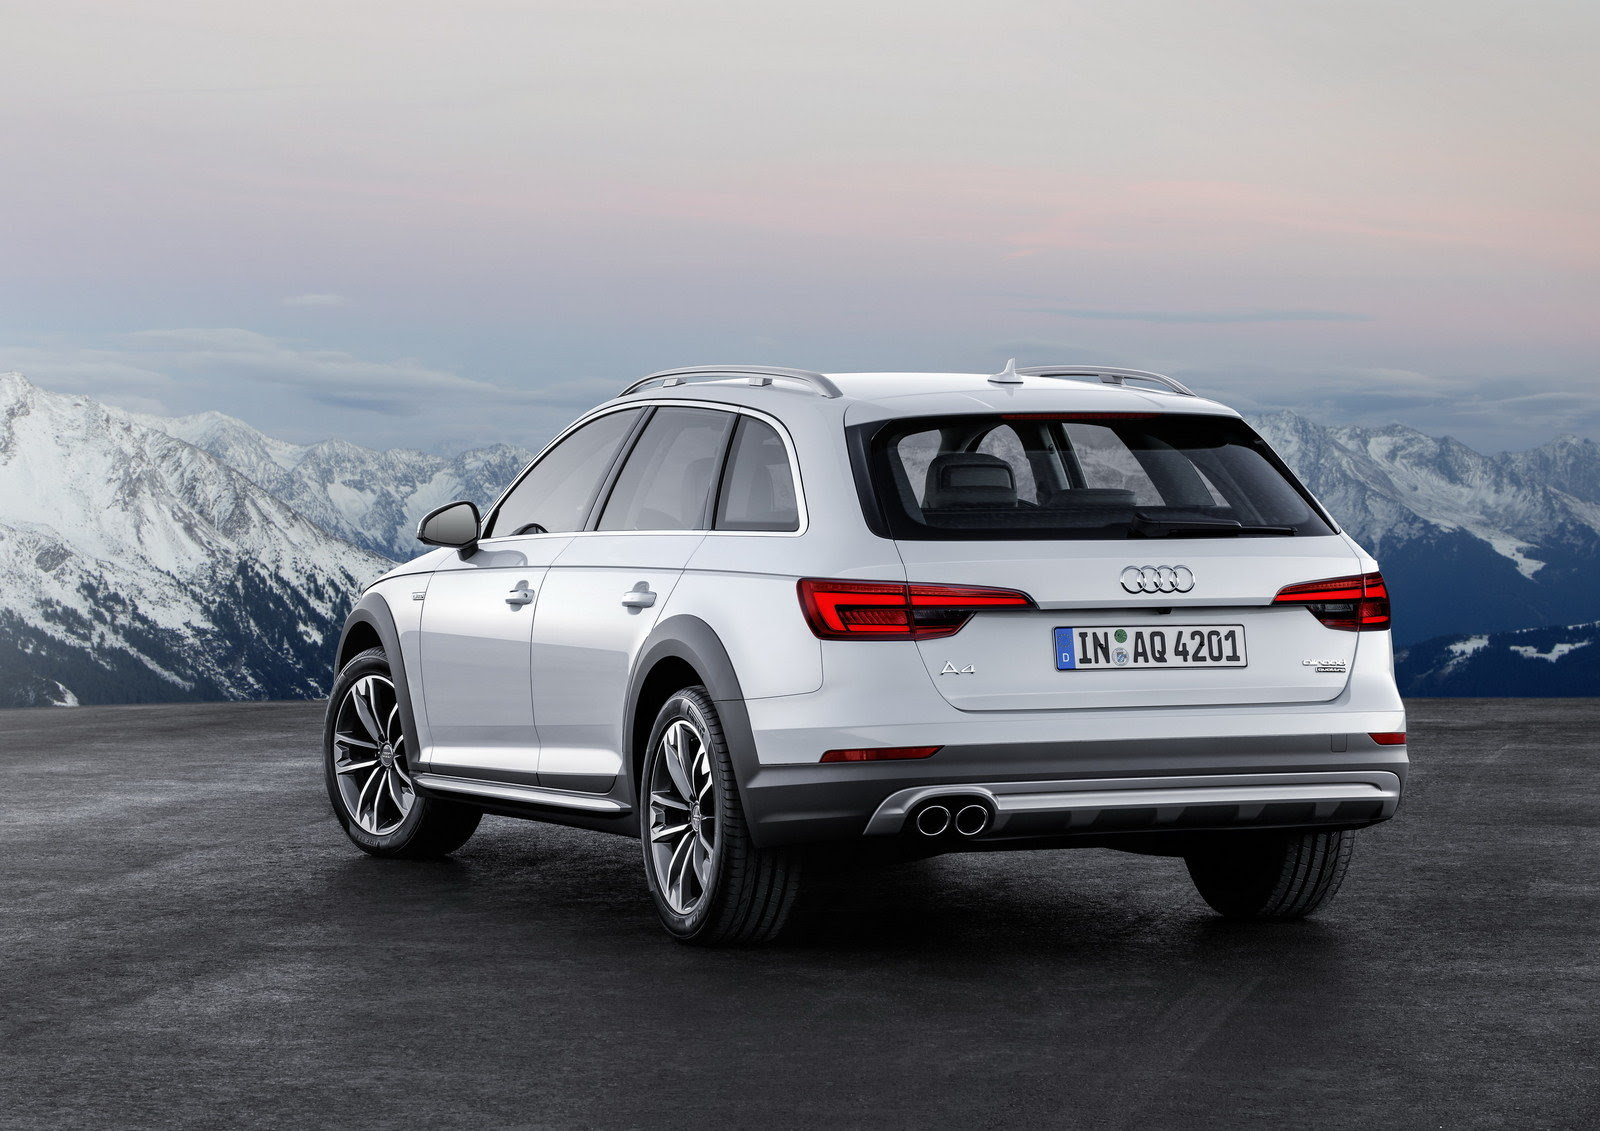 Hasil gambar untuk Audi A4 Allroad 2017